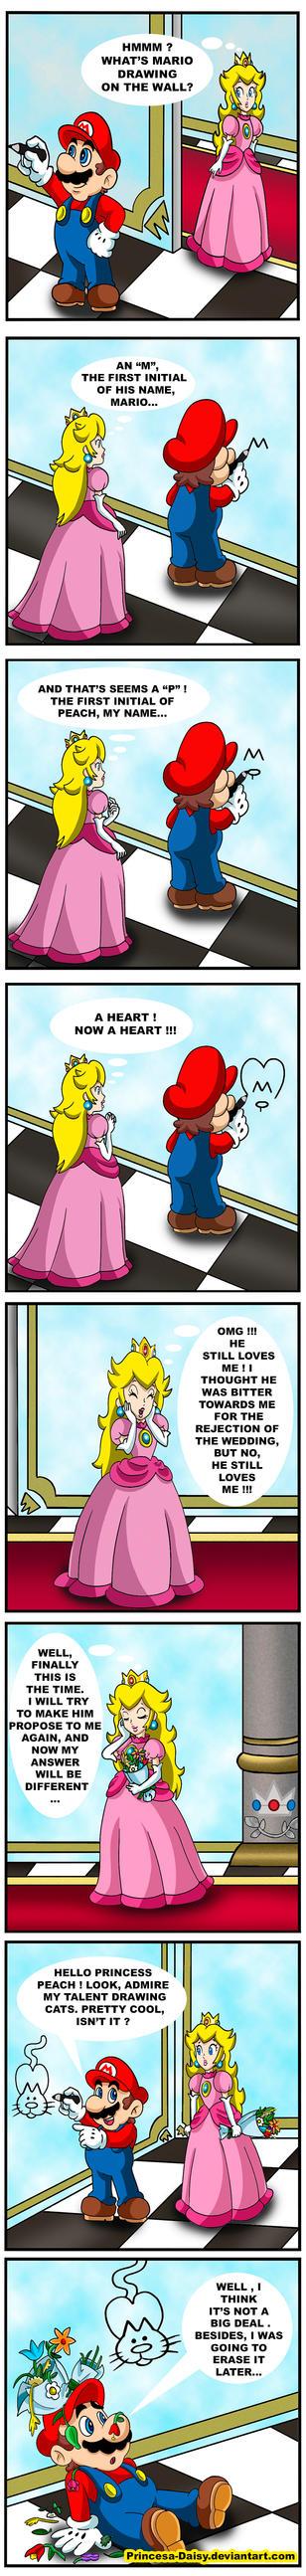 Mario and Peach - Drawing skills by Princesa-Daisy